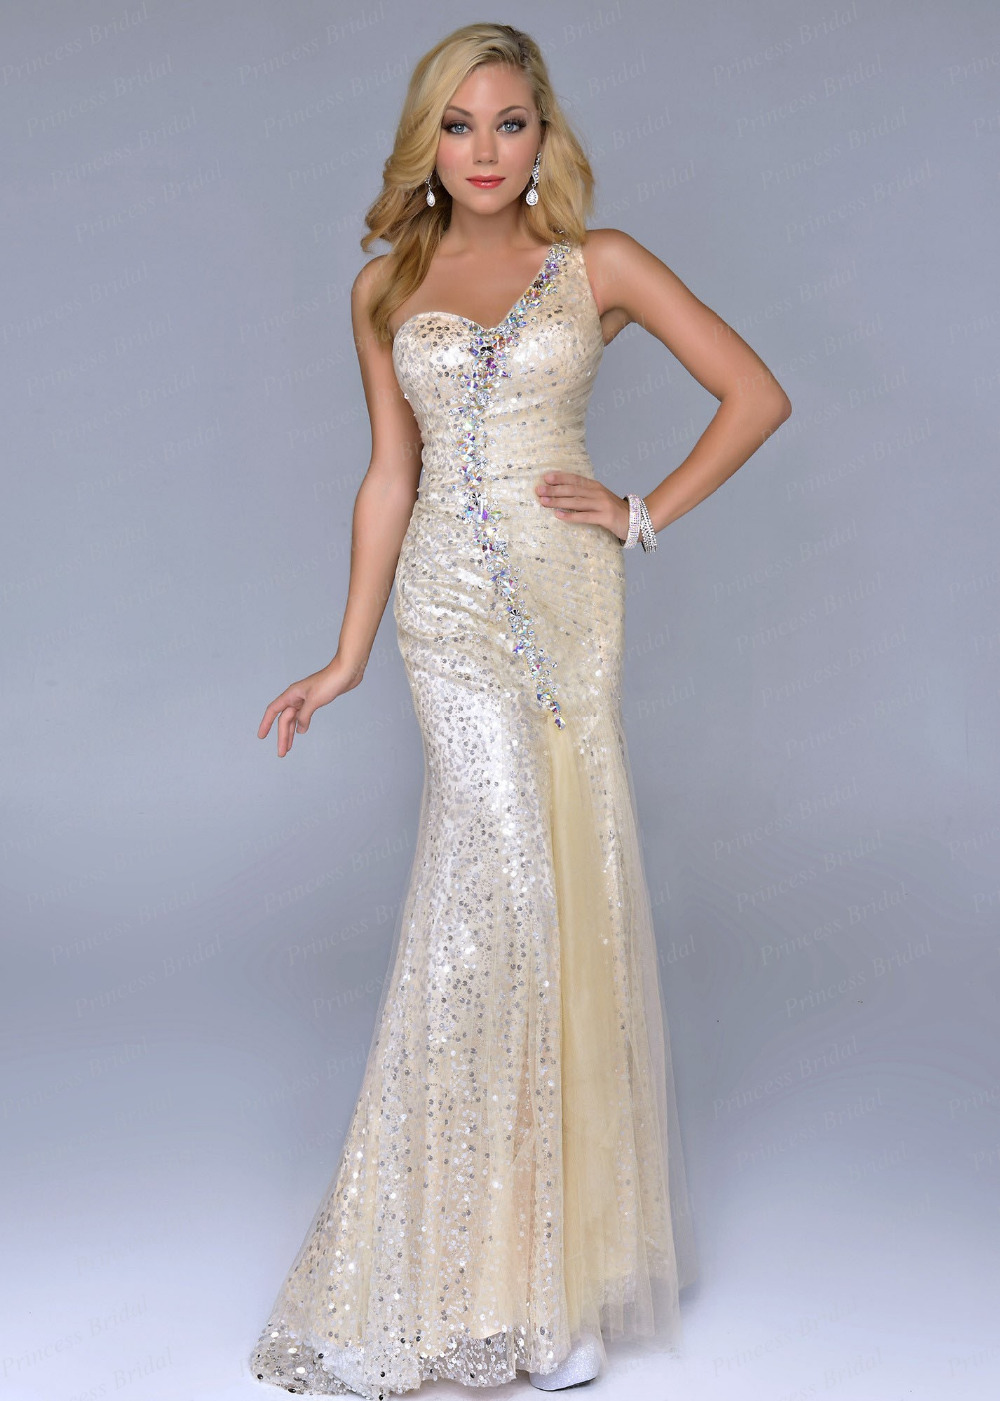 top robes blog robe de soiree haute couture libanaise With photo robe de soiree libanaise